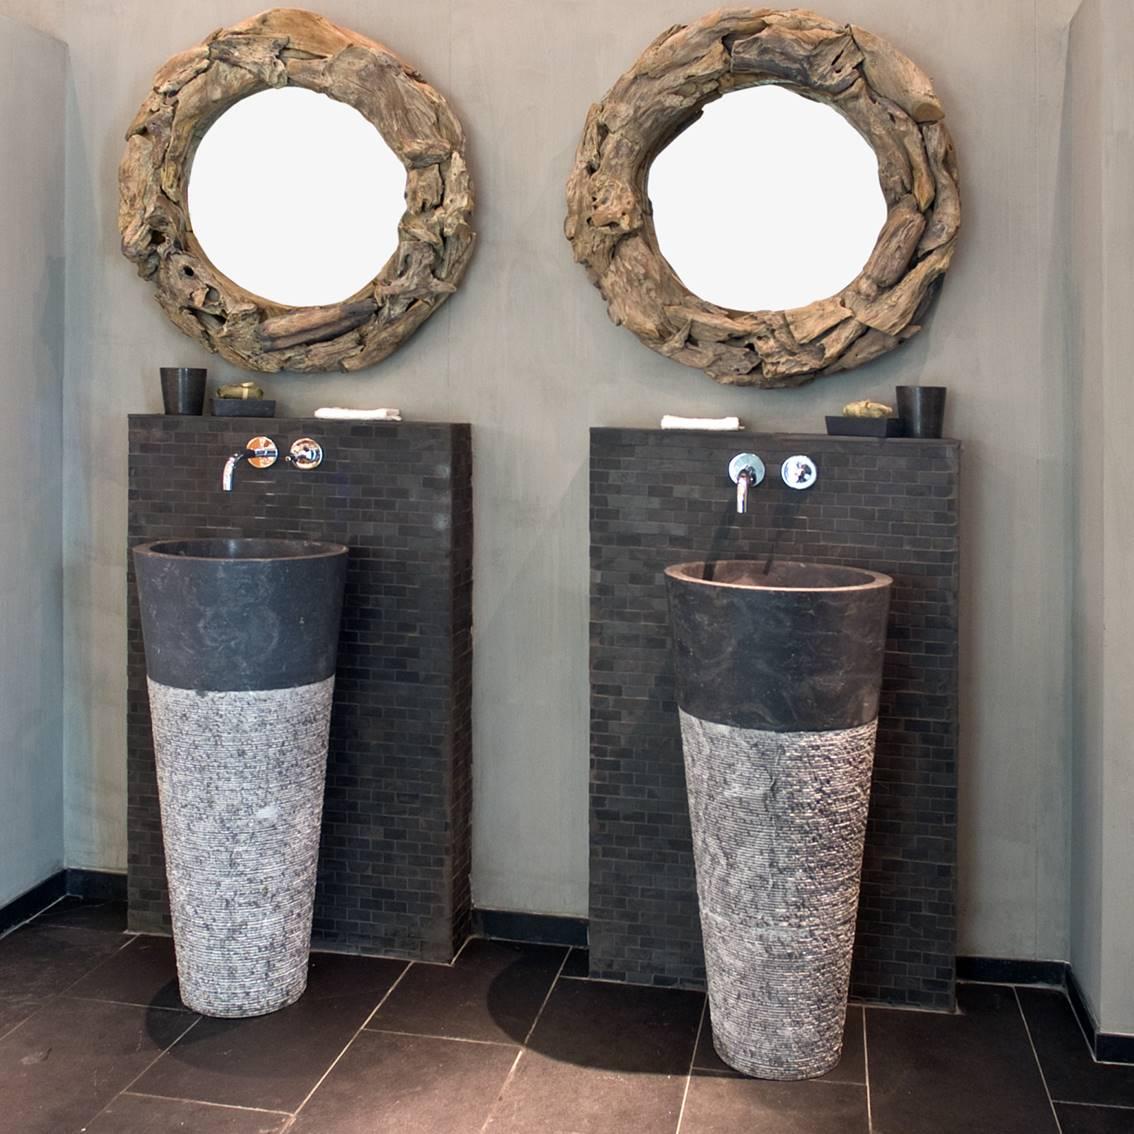 Badkamermeubel Wastafelcabinet, badkamermeubel, hoek, badkamer png | PNGEgg